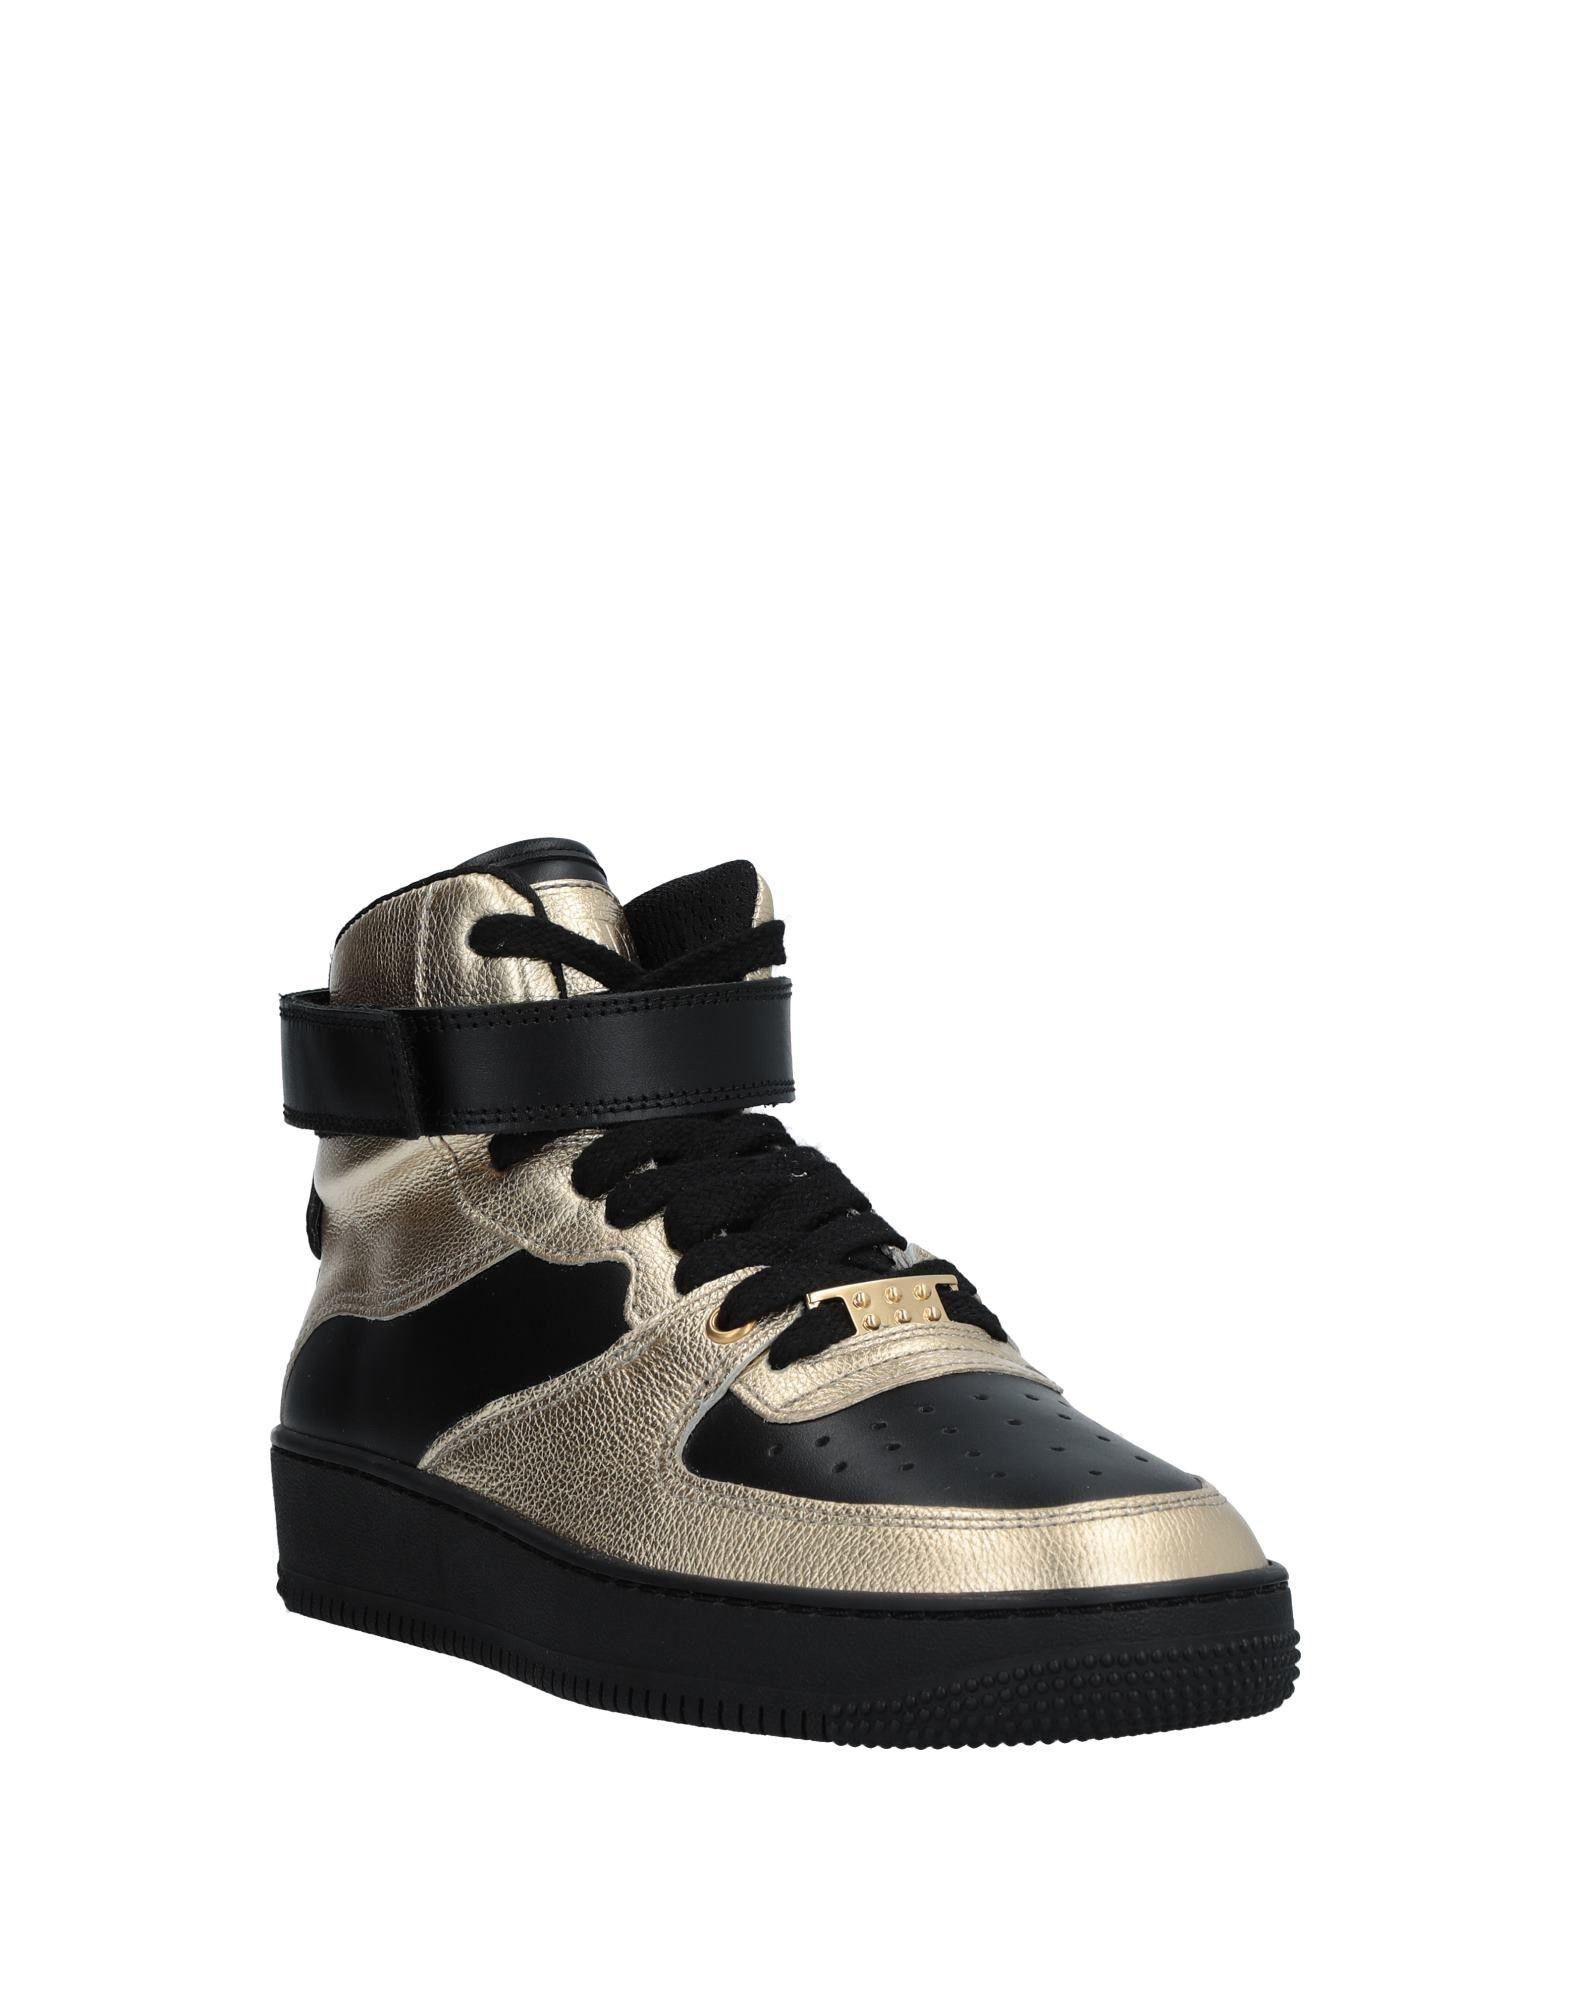 Stilvolle billige Schuhe Red(V) Sneakers 11526786DS Damen  11526786DS Sneakers d31ebc